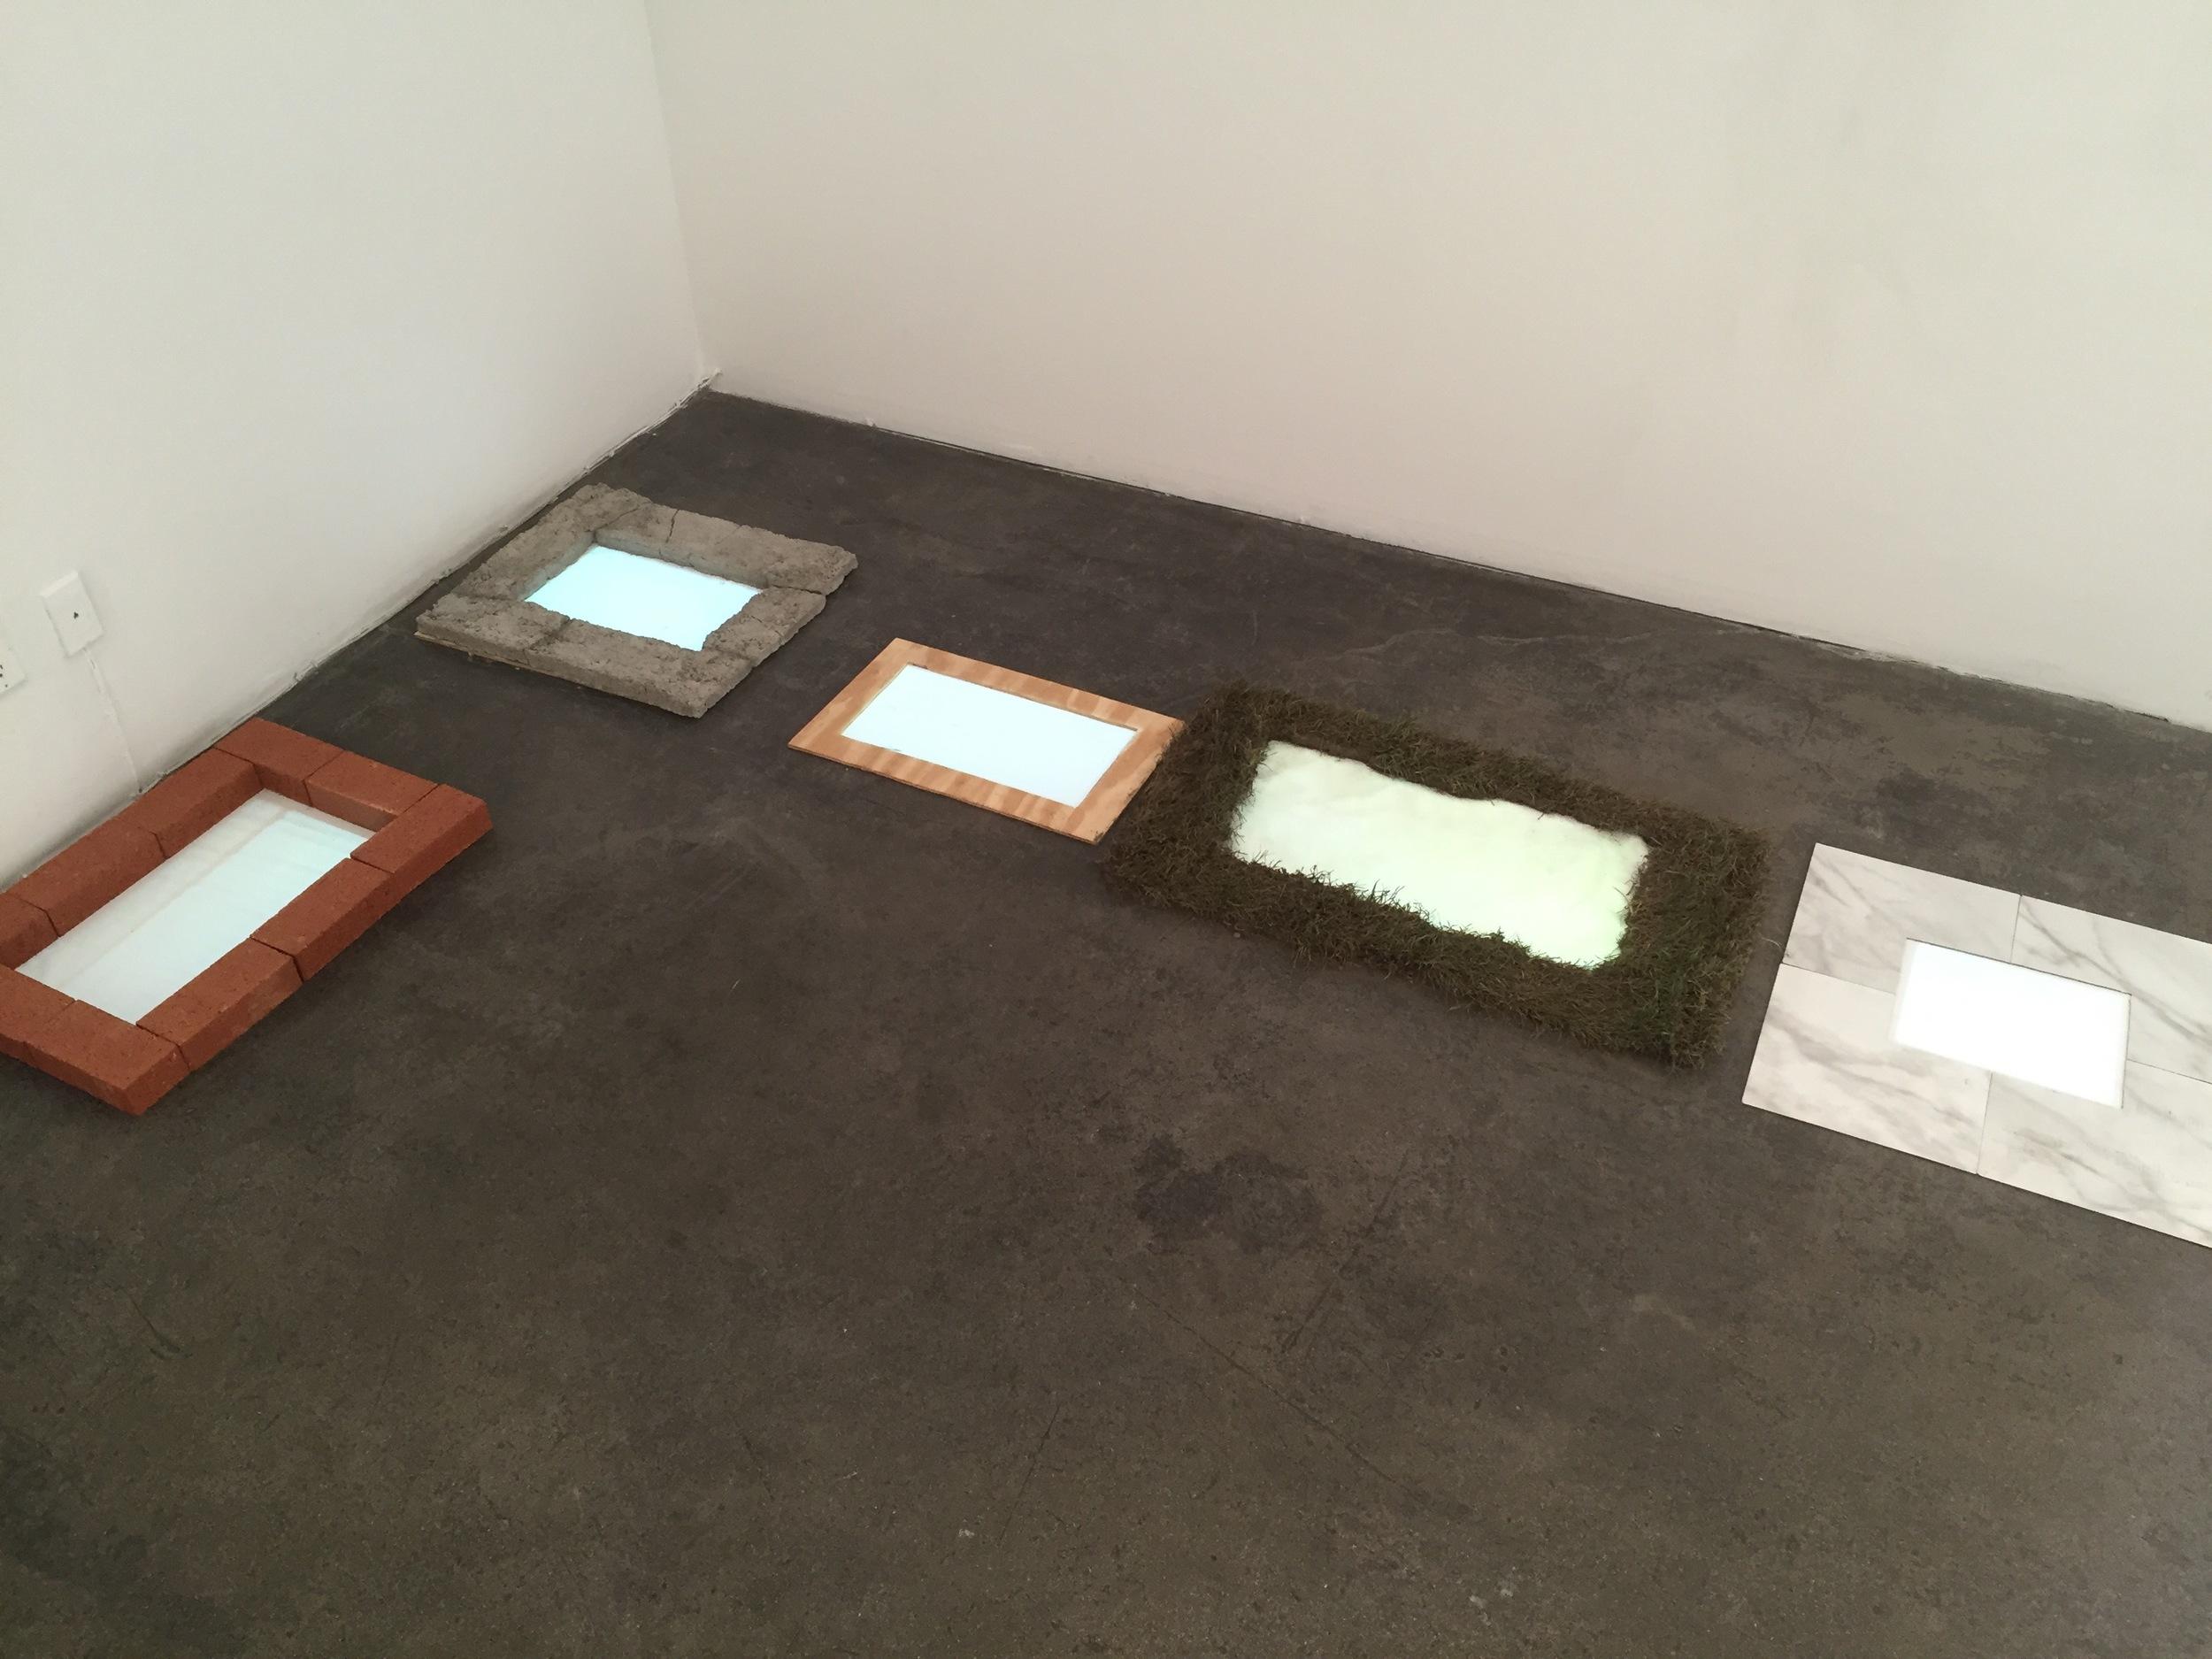 Isabelle Harada  Find your Feet , 2016 5 channel video installation Concrete, wood, brick, sod, linoleum, projection  Variable arrangement